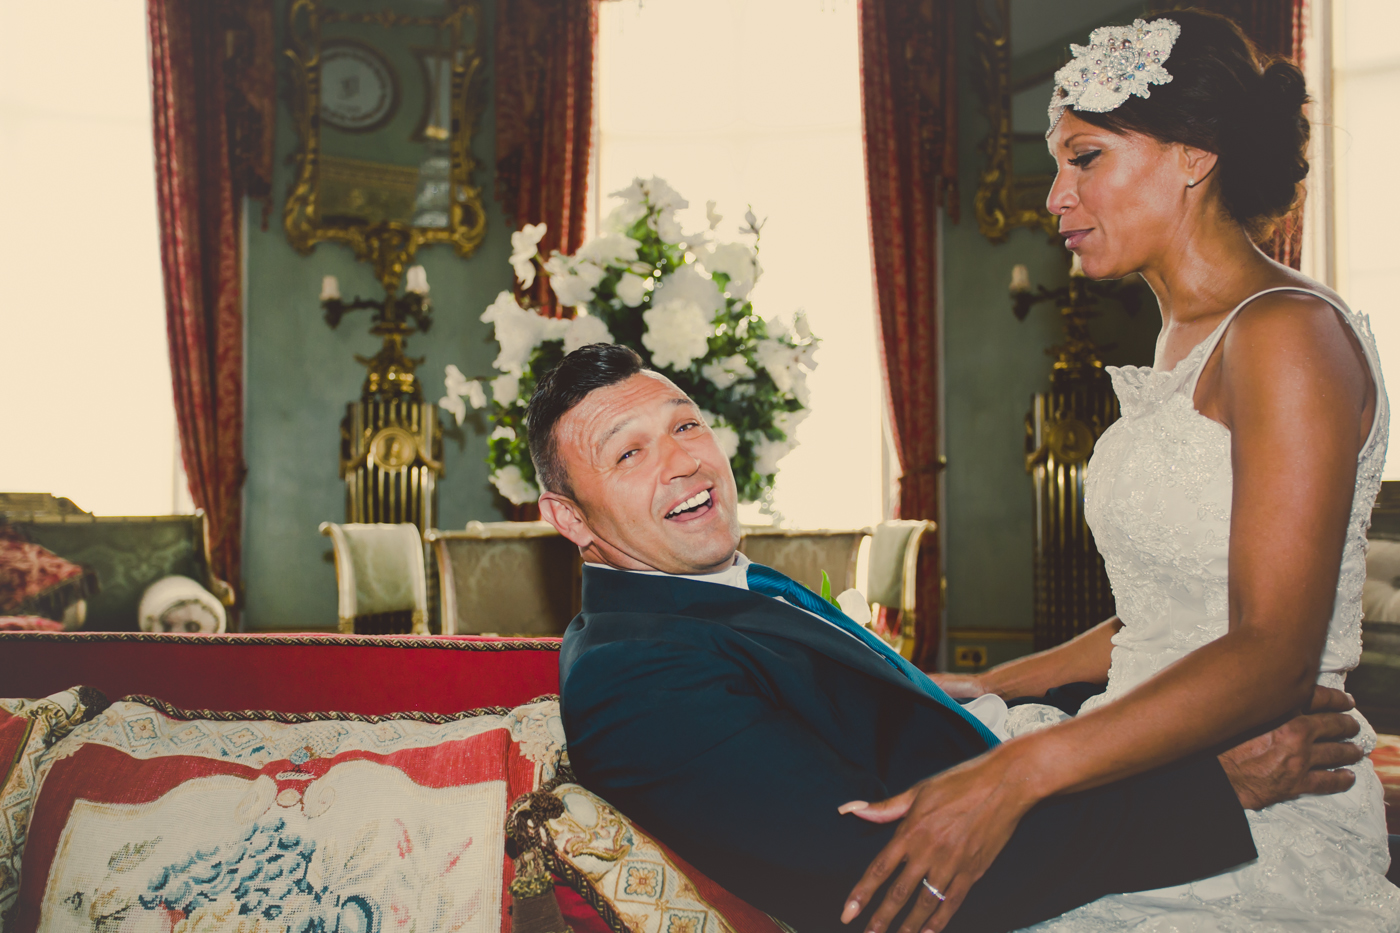 114 Donna and John Wedding Photography at Belvoir Castle www.belvoircastle.com UK by Mark Pugh.JPG